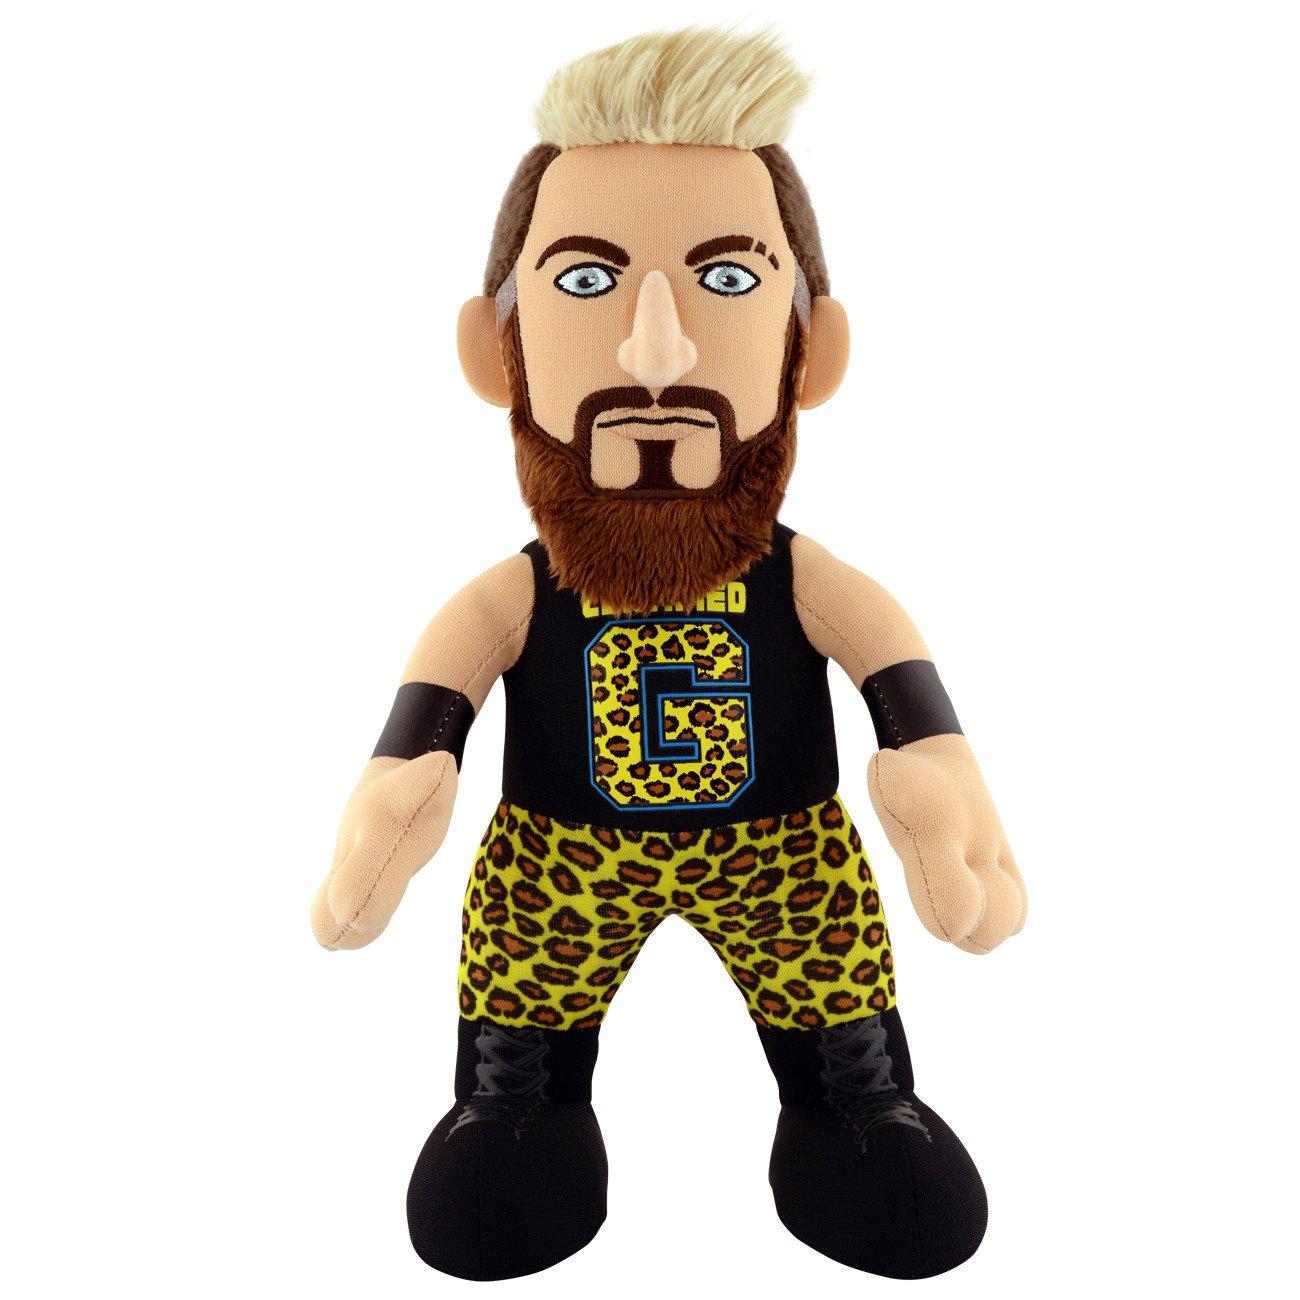 "WWE Jeff Hardy 10"" Plush Figure"